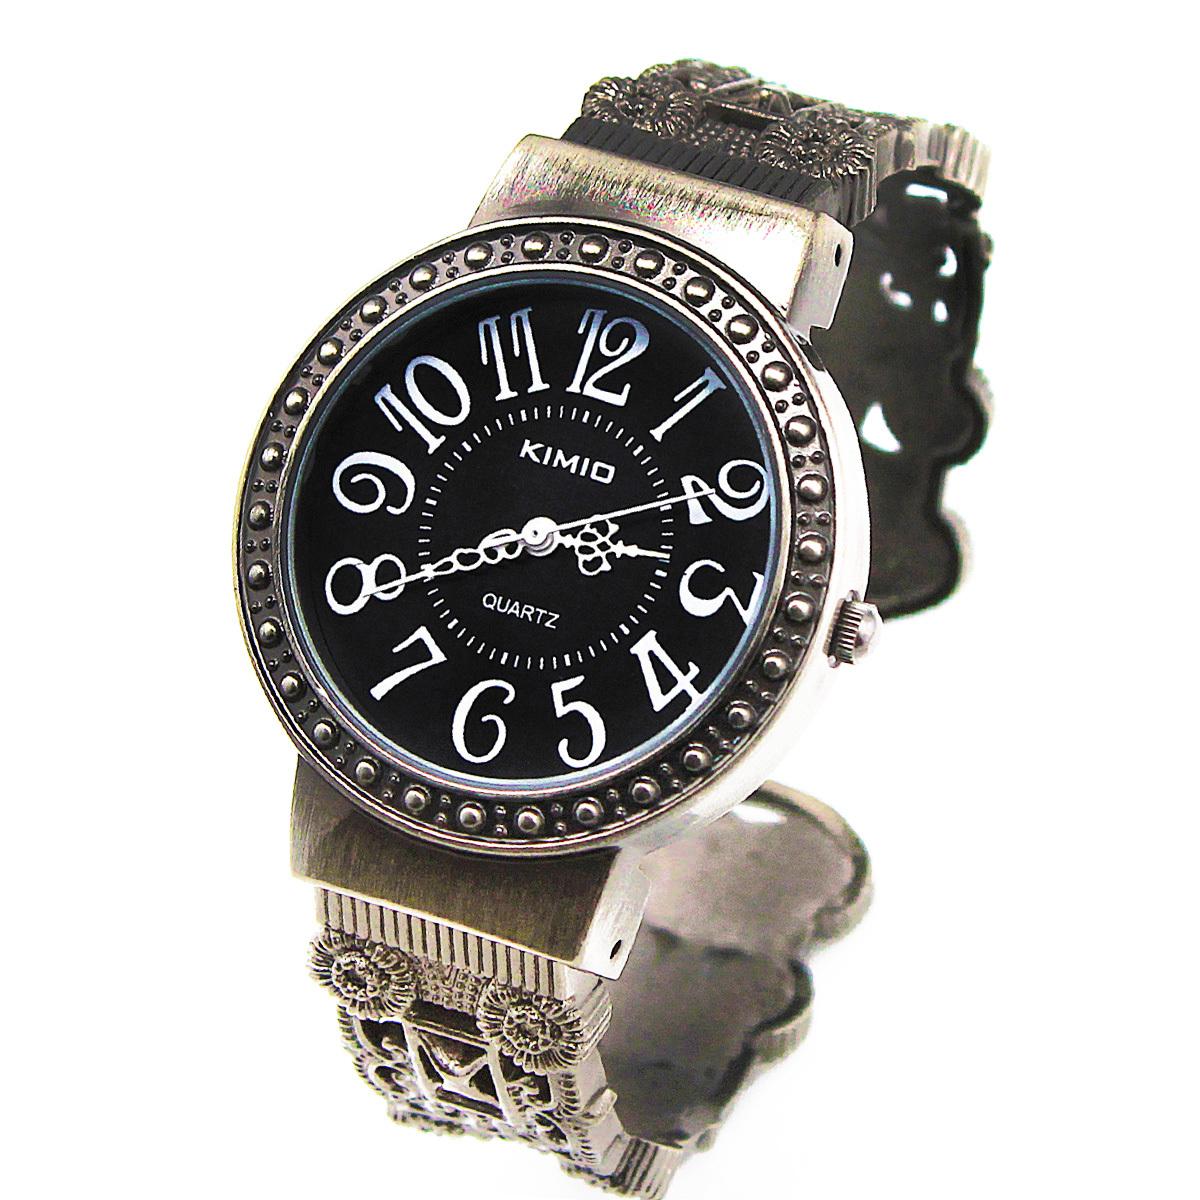 Часы Kimio Zgo 2933 Кварцевые часы Женские Китай 2011